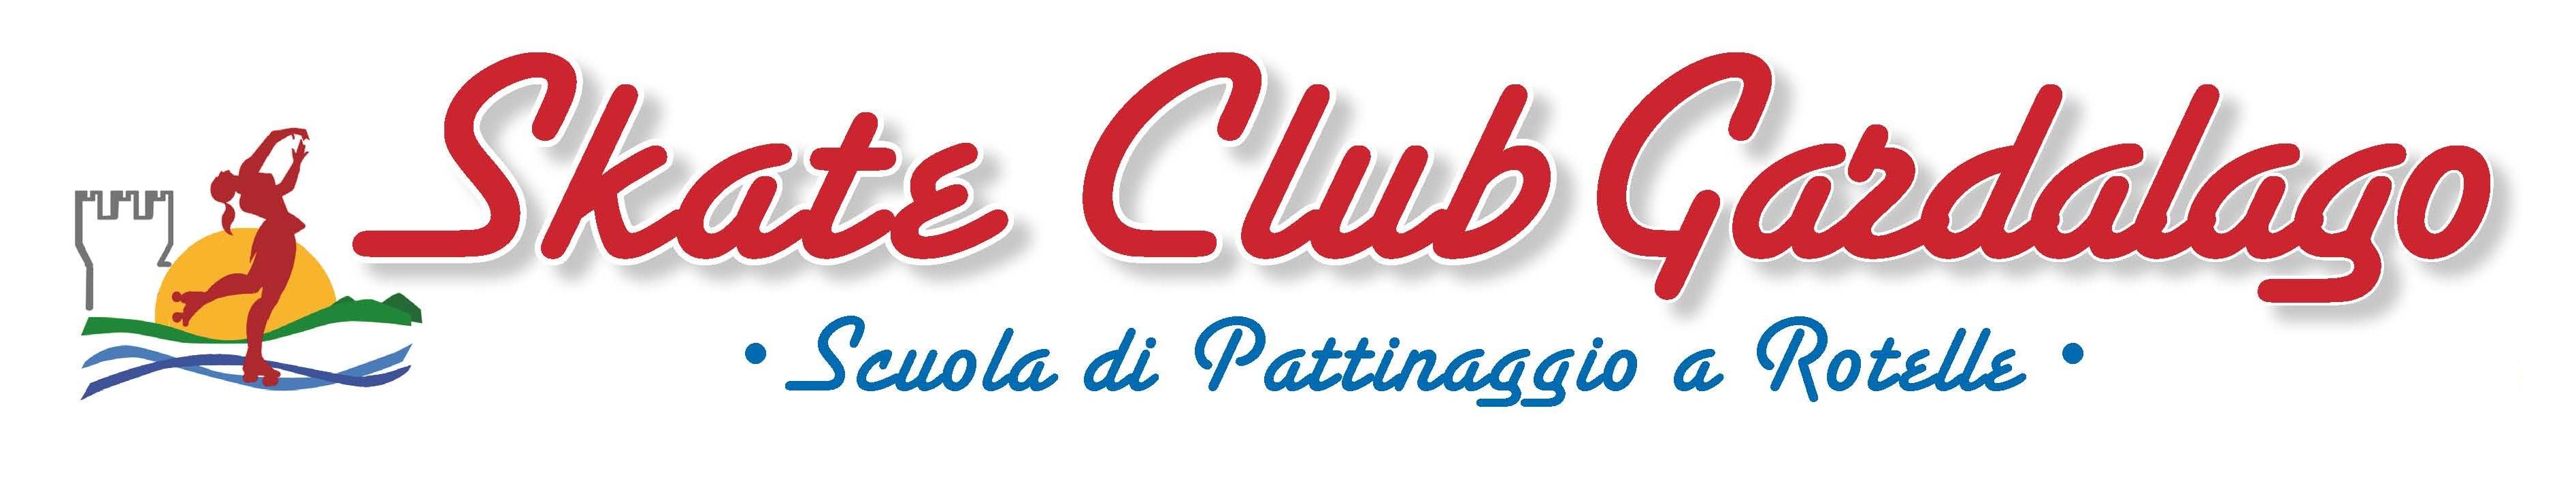 Skate Club Gardalago